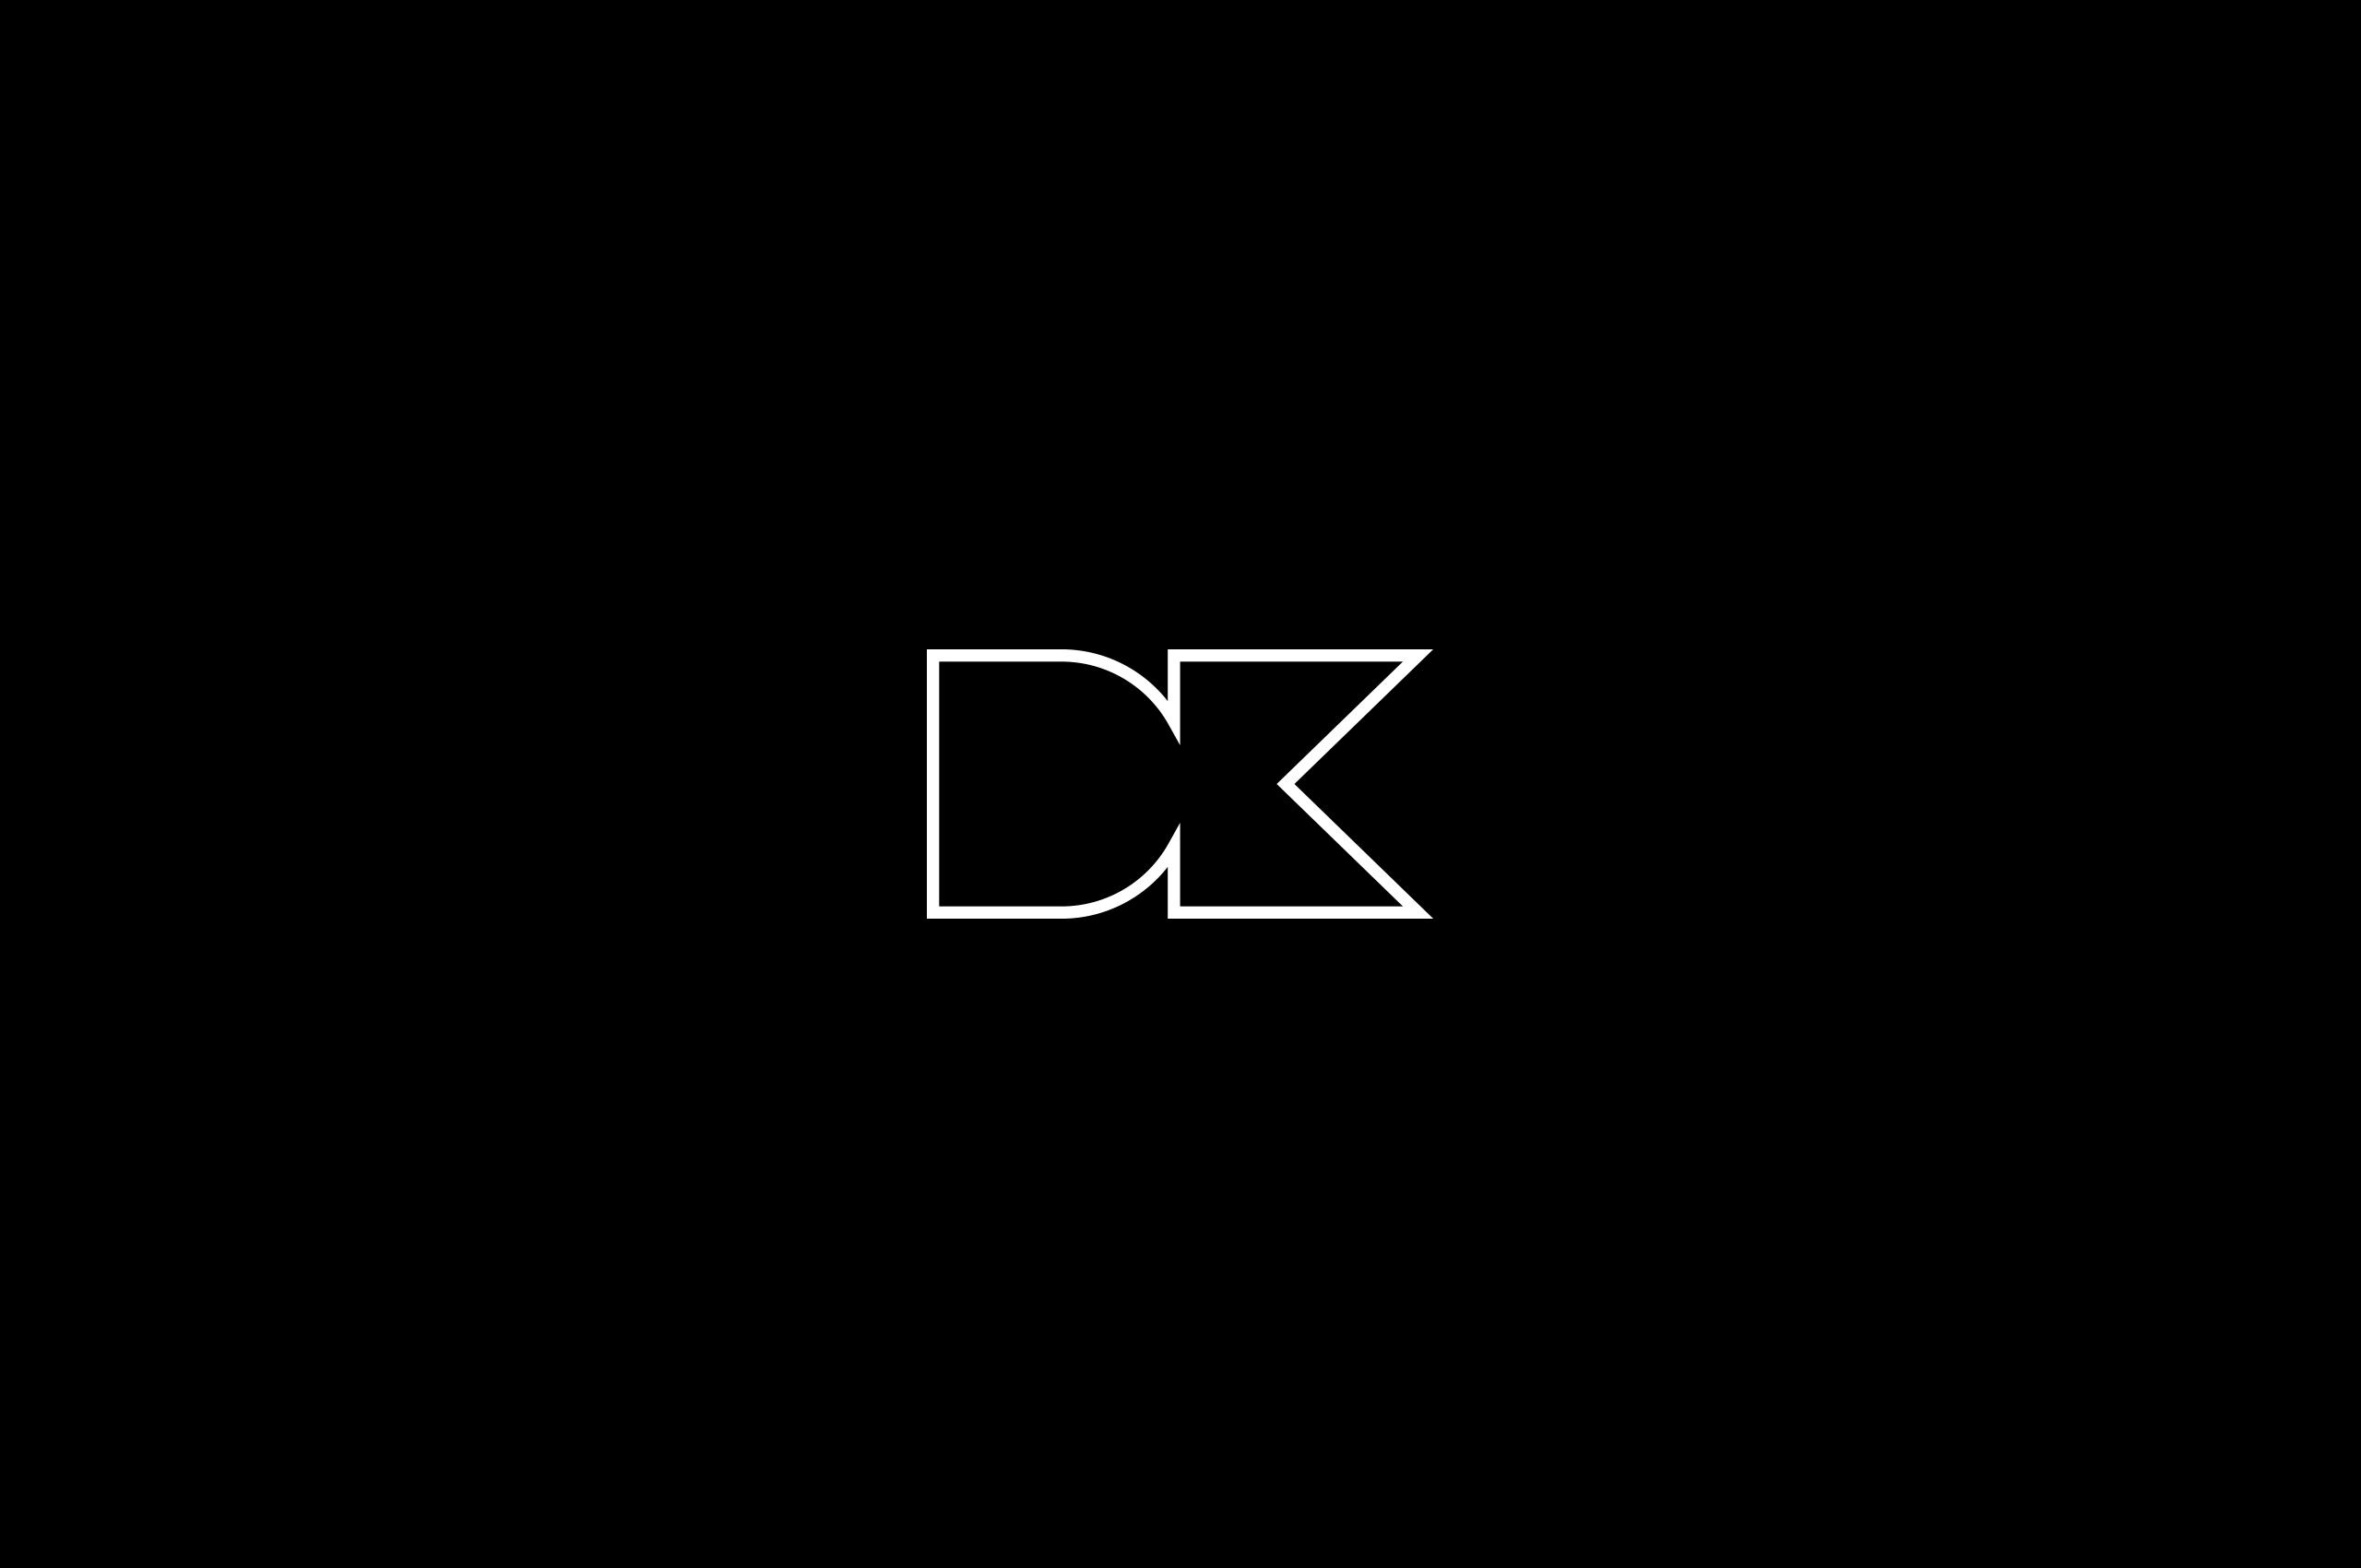 logo-27-black